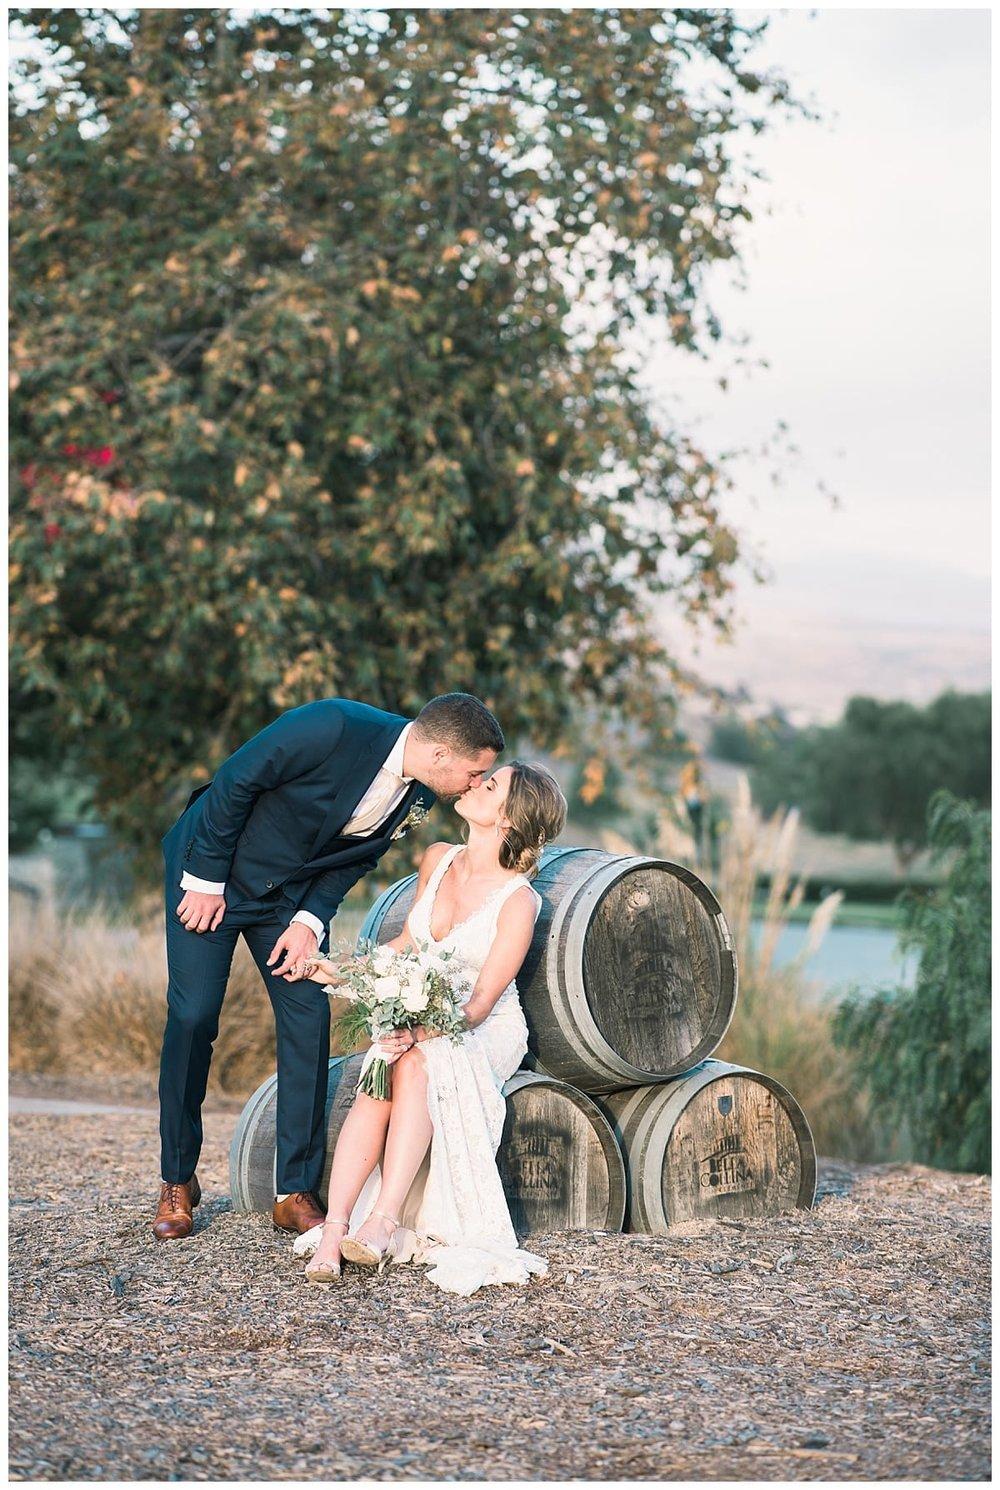 Bella-Collina-San-Clemente-Wedding-Carissa-Woo-Photography_0002.jpg